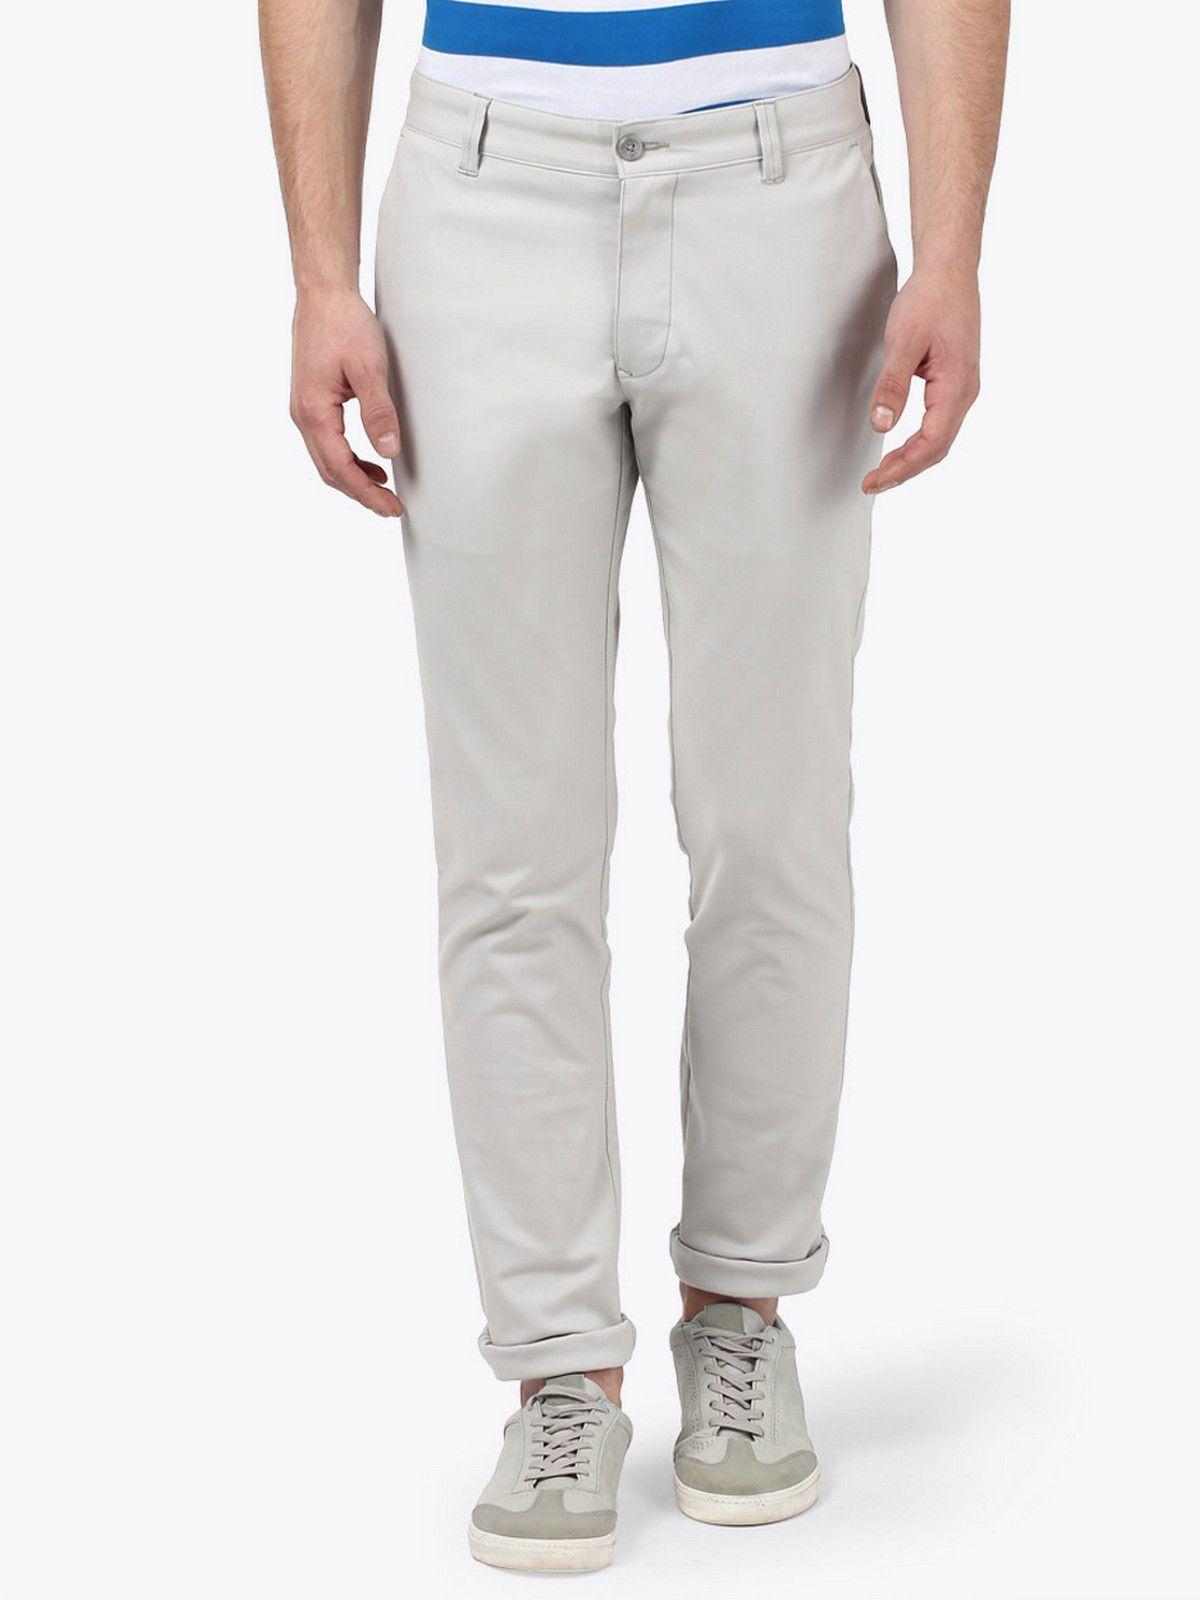 Parx Grey Slim -Fit Flat Trousers